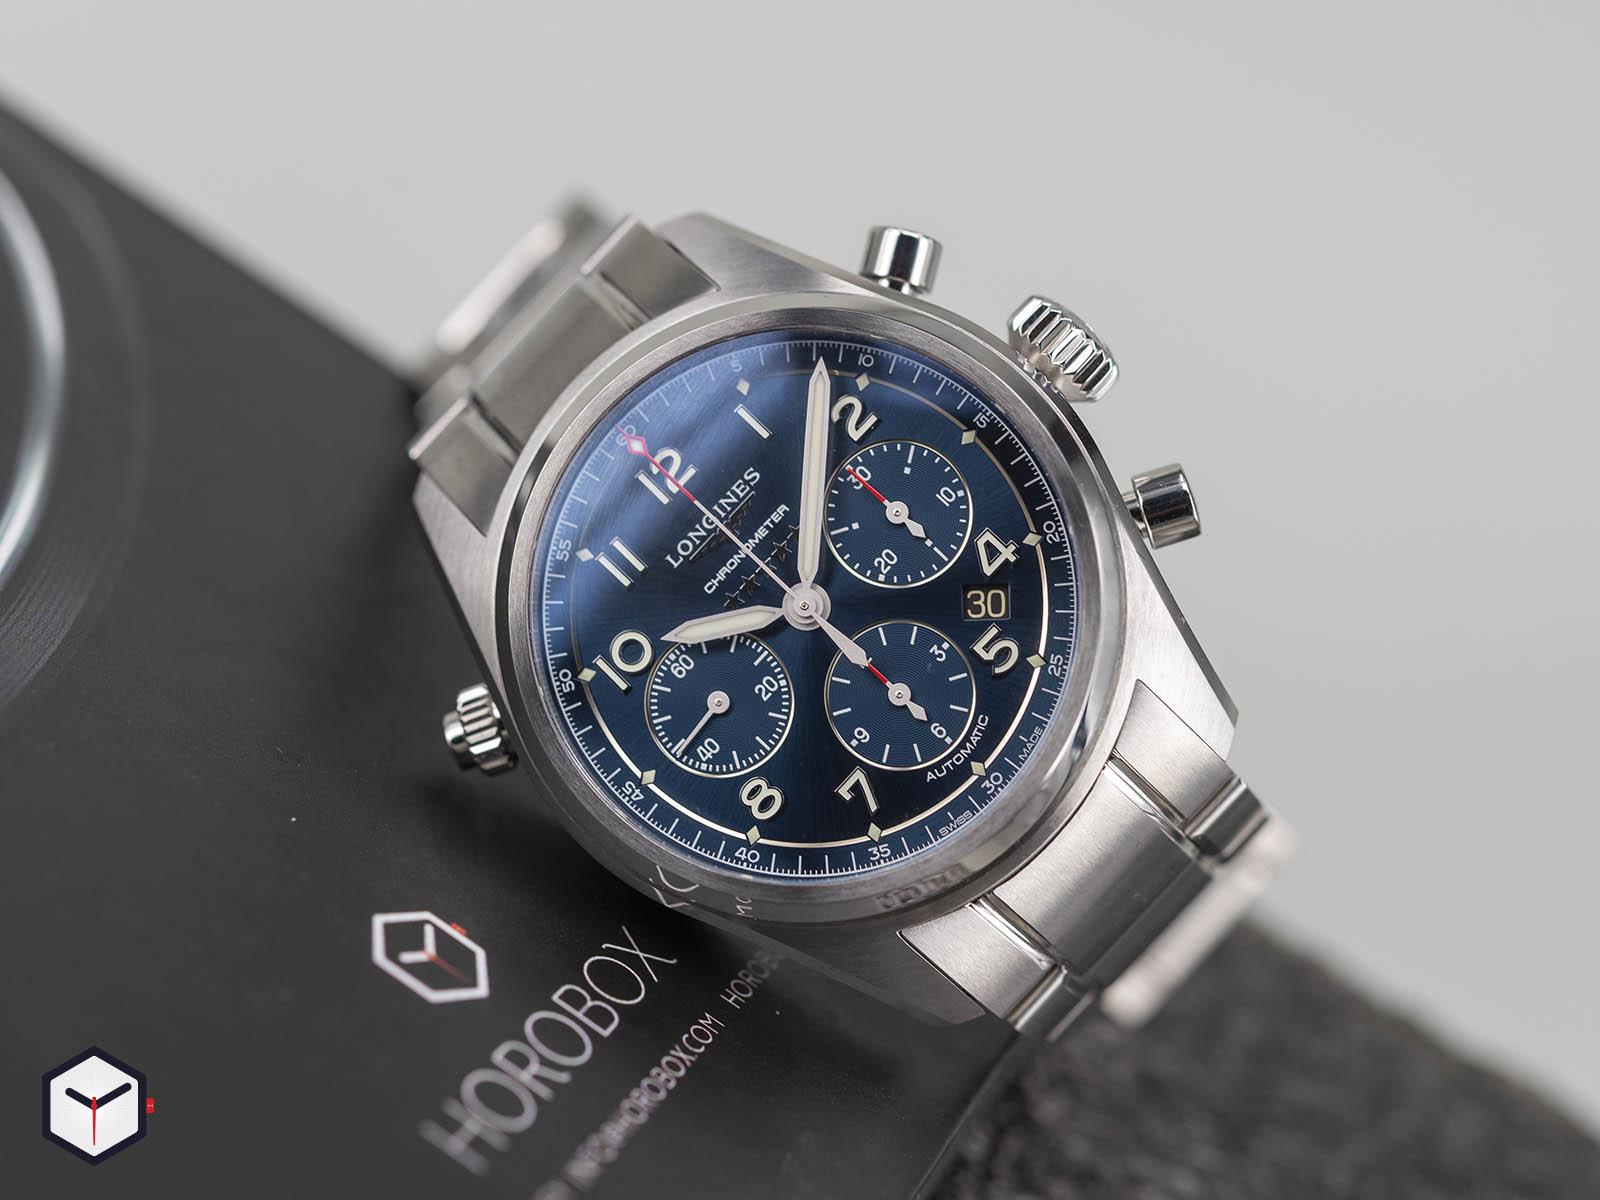 l3-820-4-93-6-longines-spirit-chronograph-collection-1.jpg